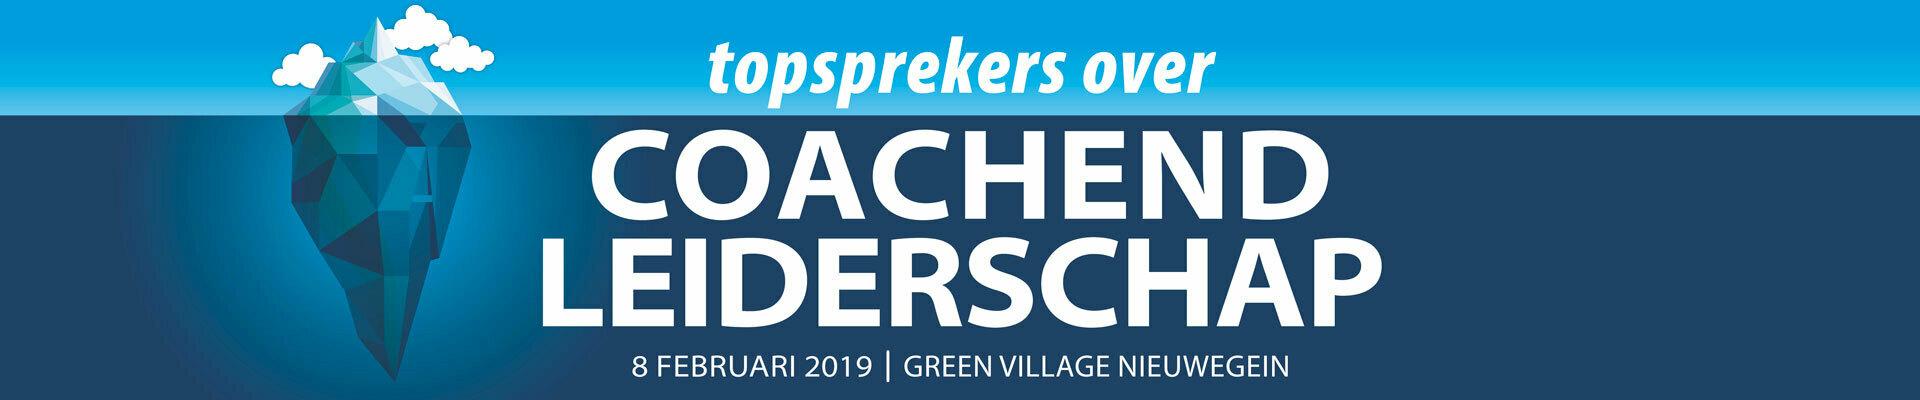 (BTW) Topsprekers over coachend leiderschap   8 februari 2019